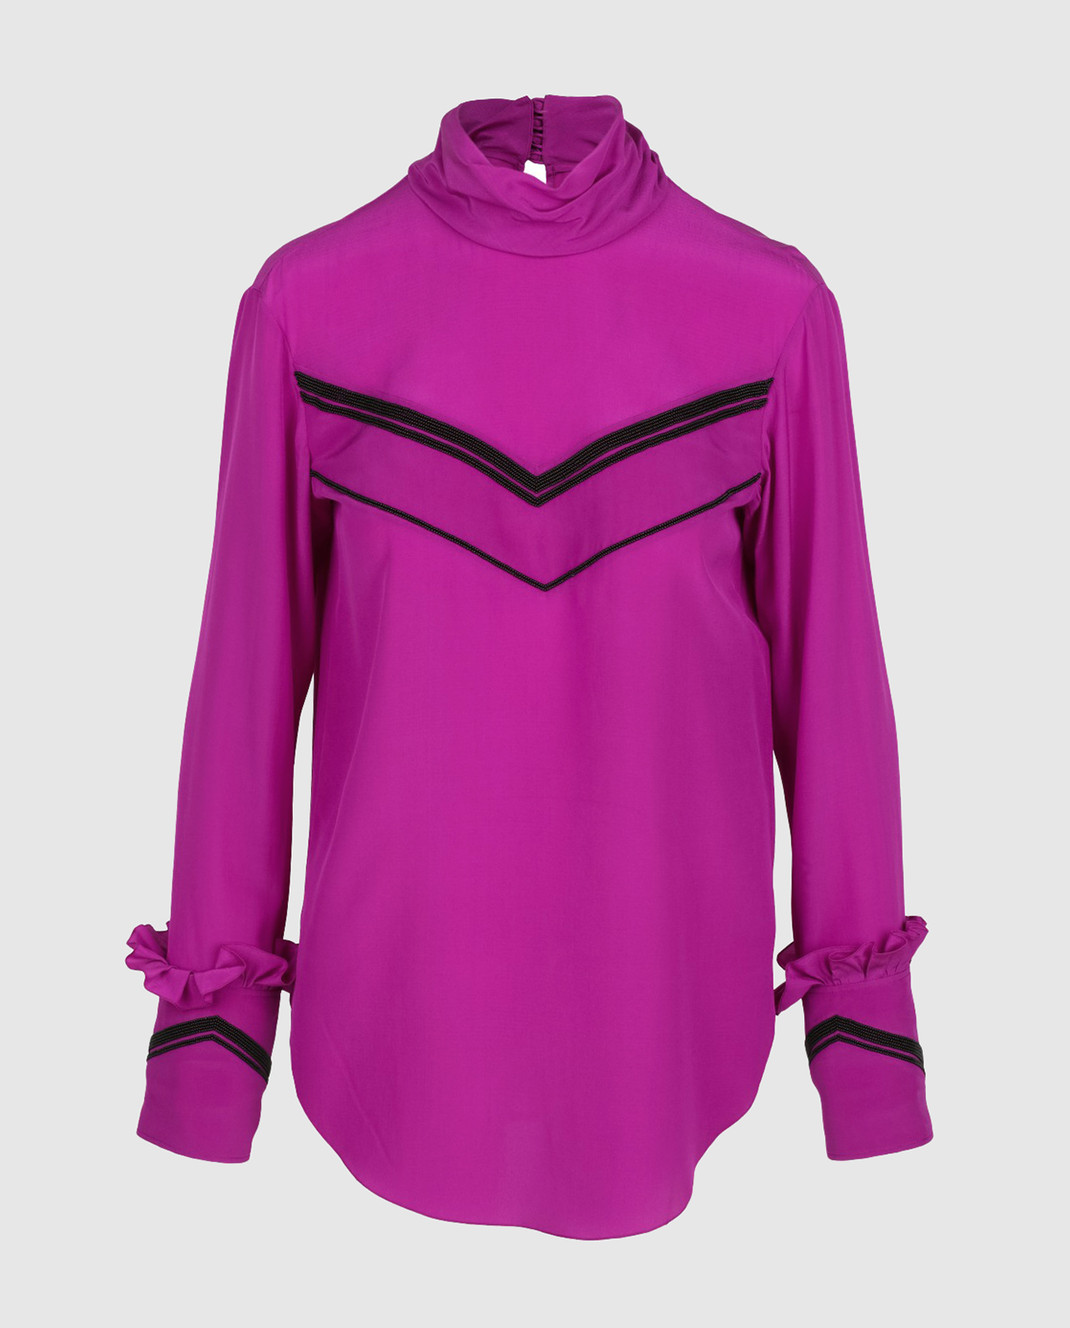 NINA RICCI Розовая блуза из шелка 17PCTO016SE0801